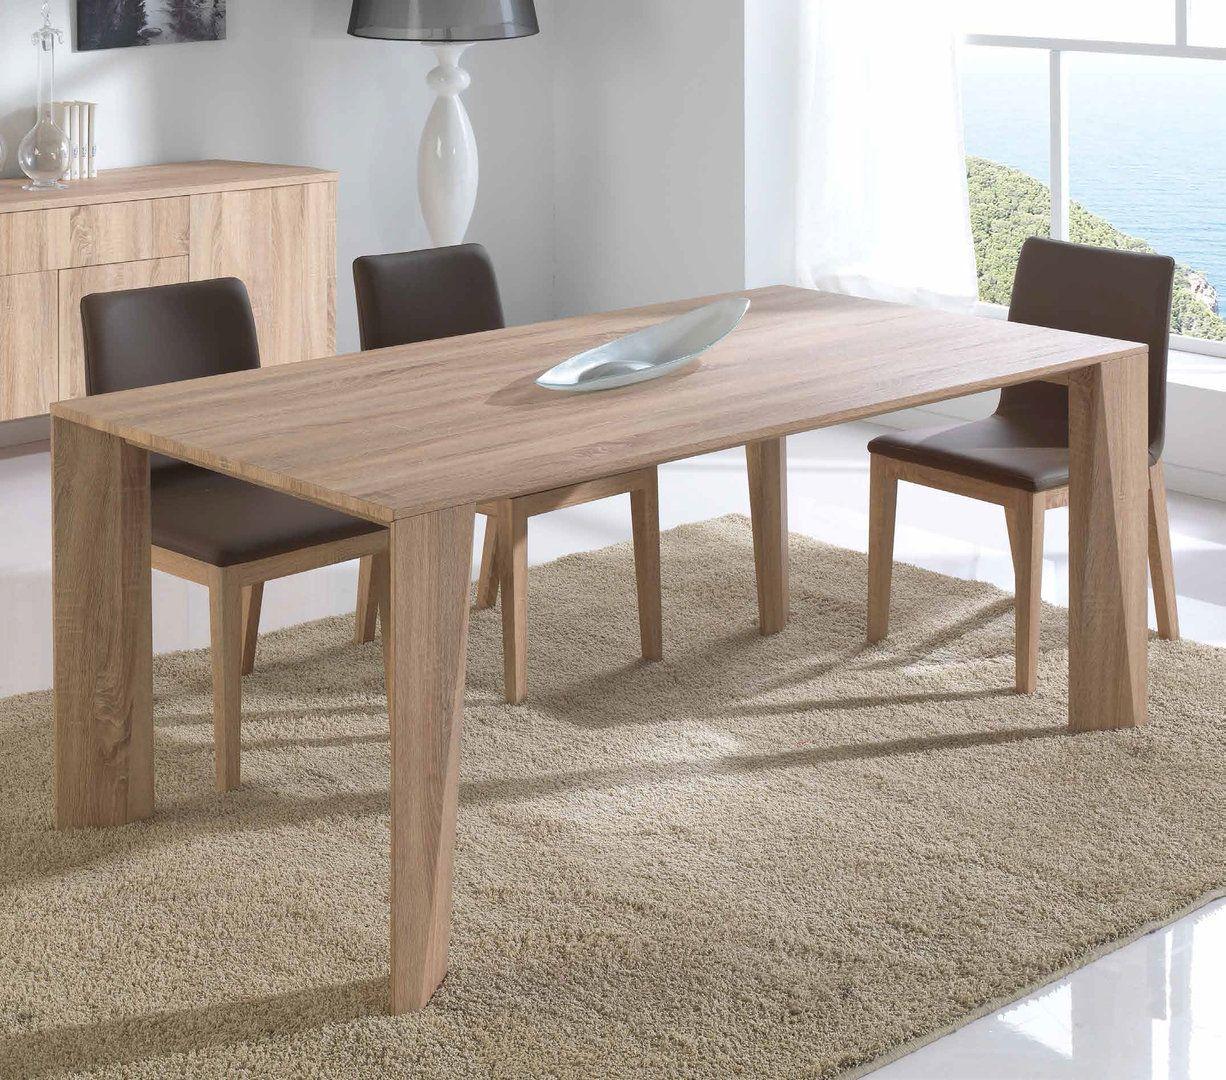 MESA DE COMEDOR MODERNA LONDON muebles interiordesign